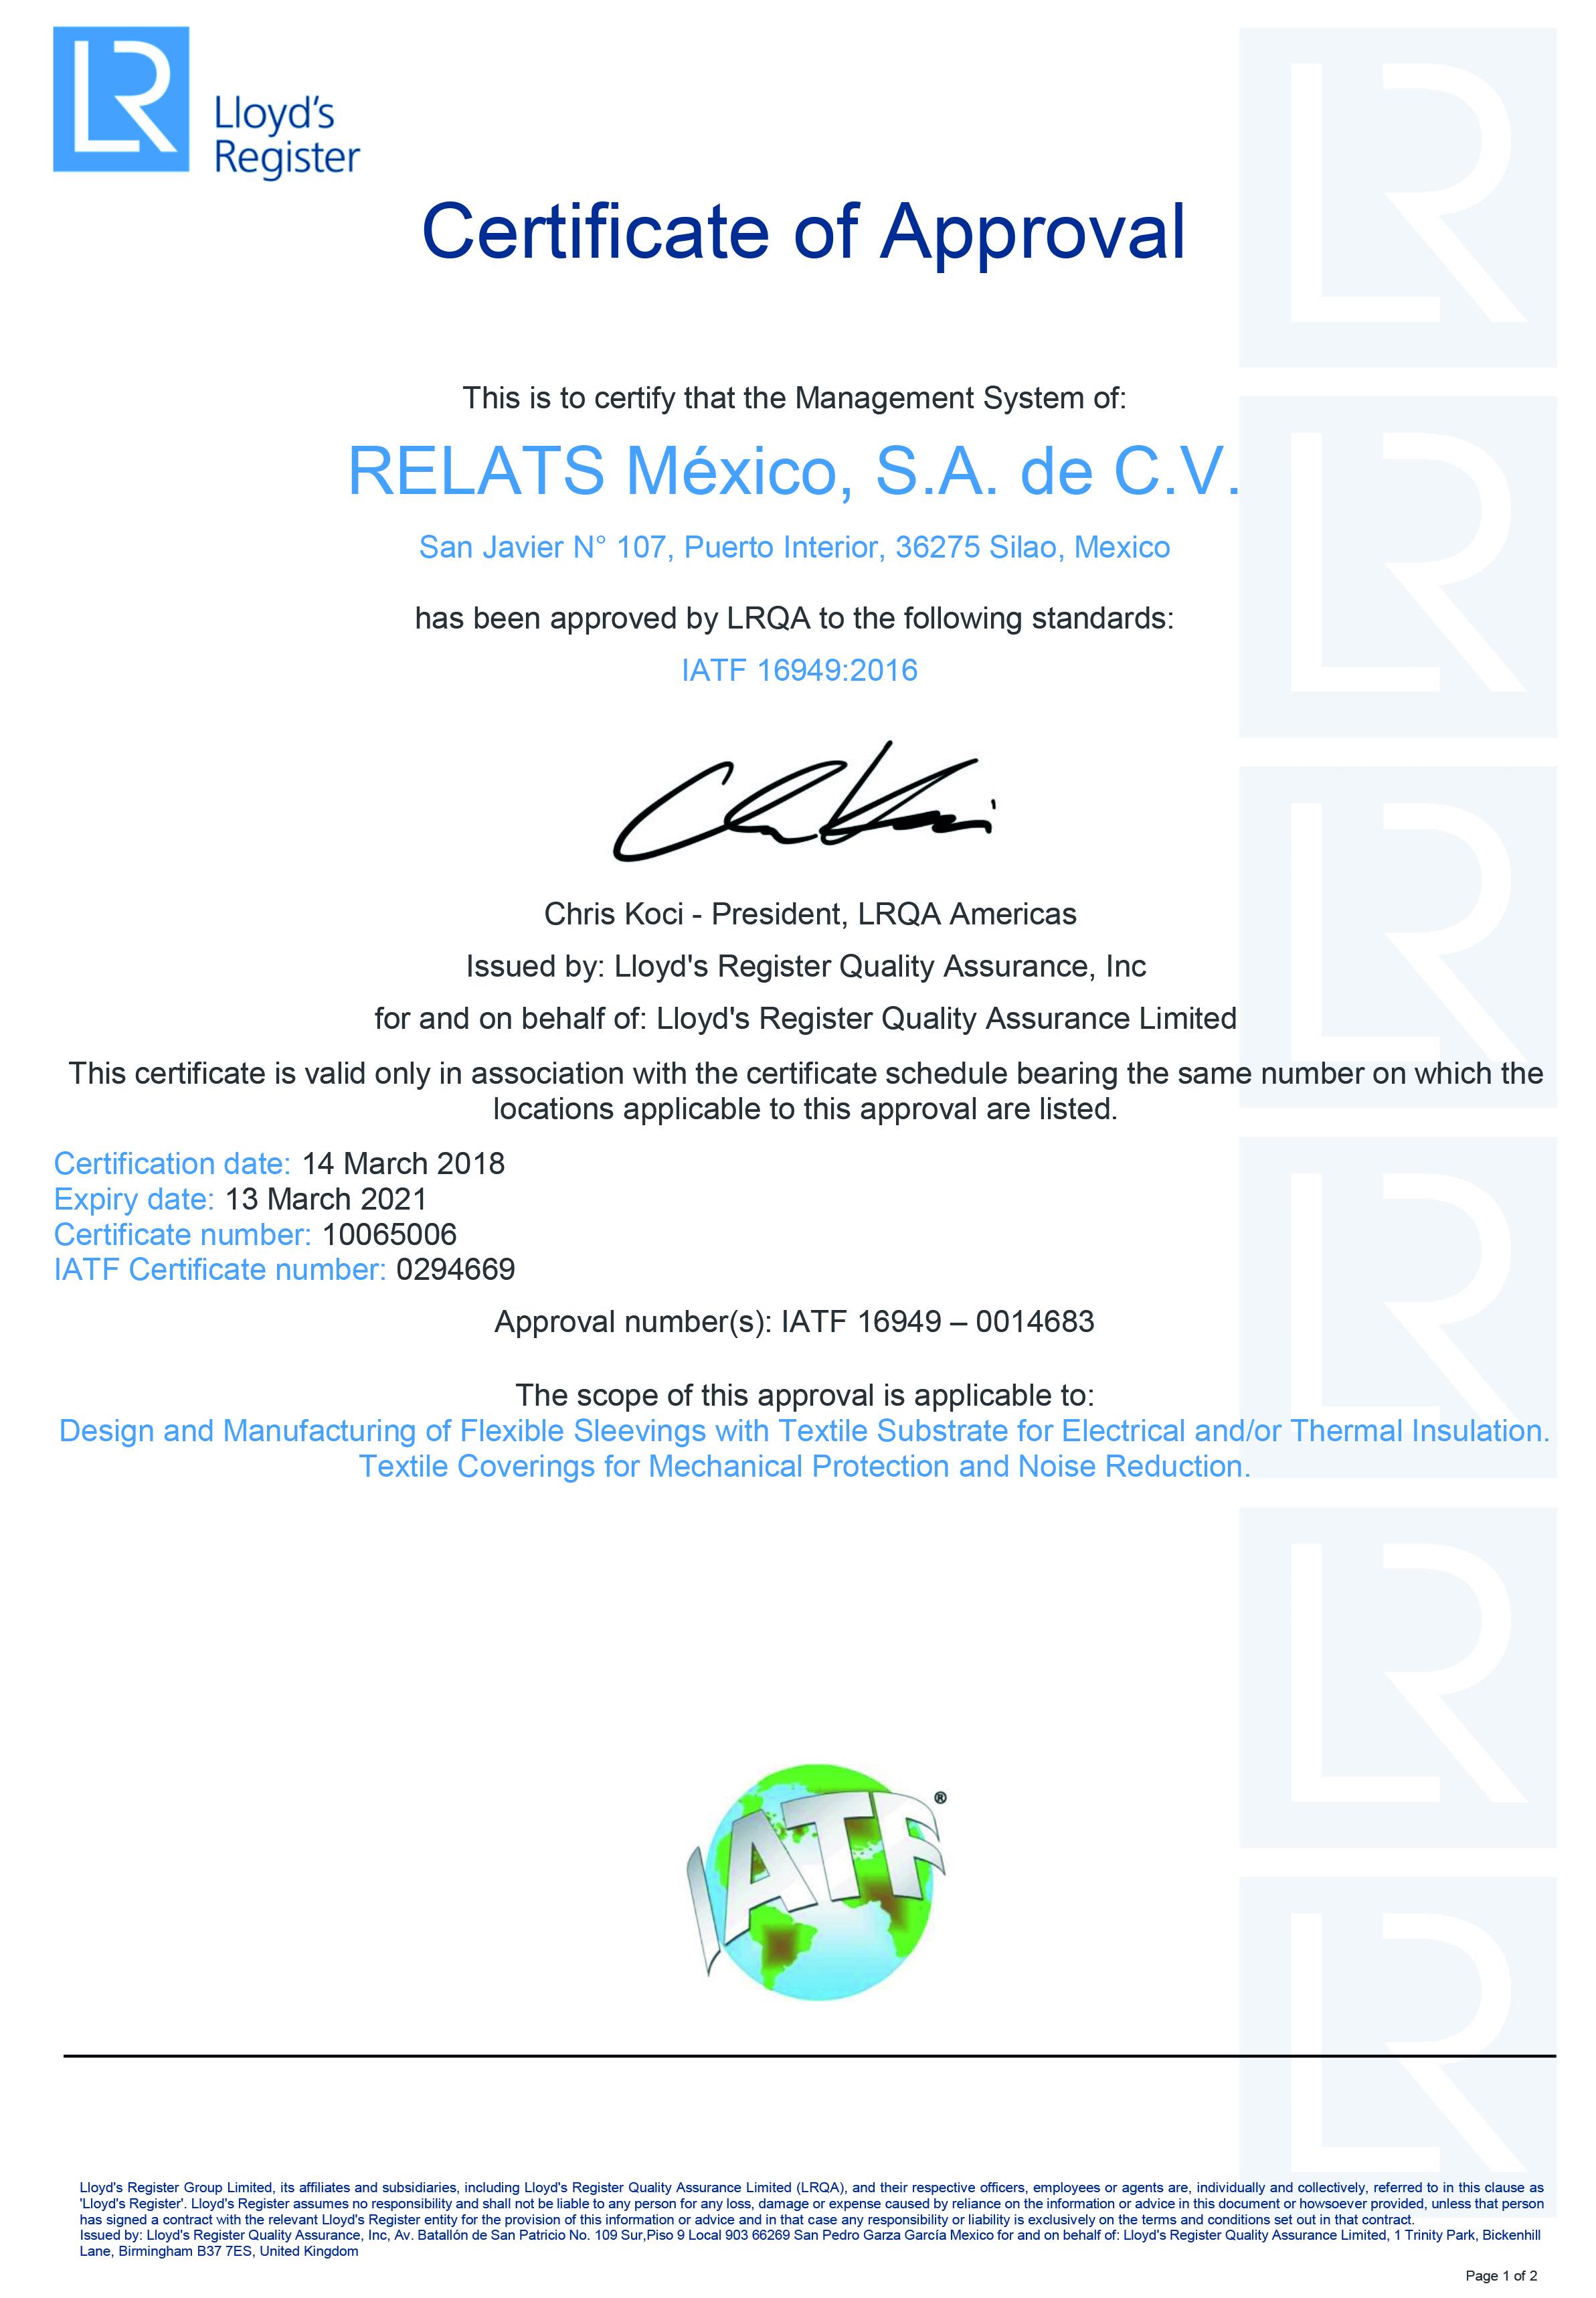 IATF 16949:2016 Certificat RelatsMèxic